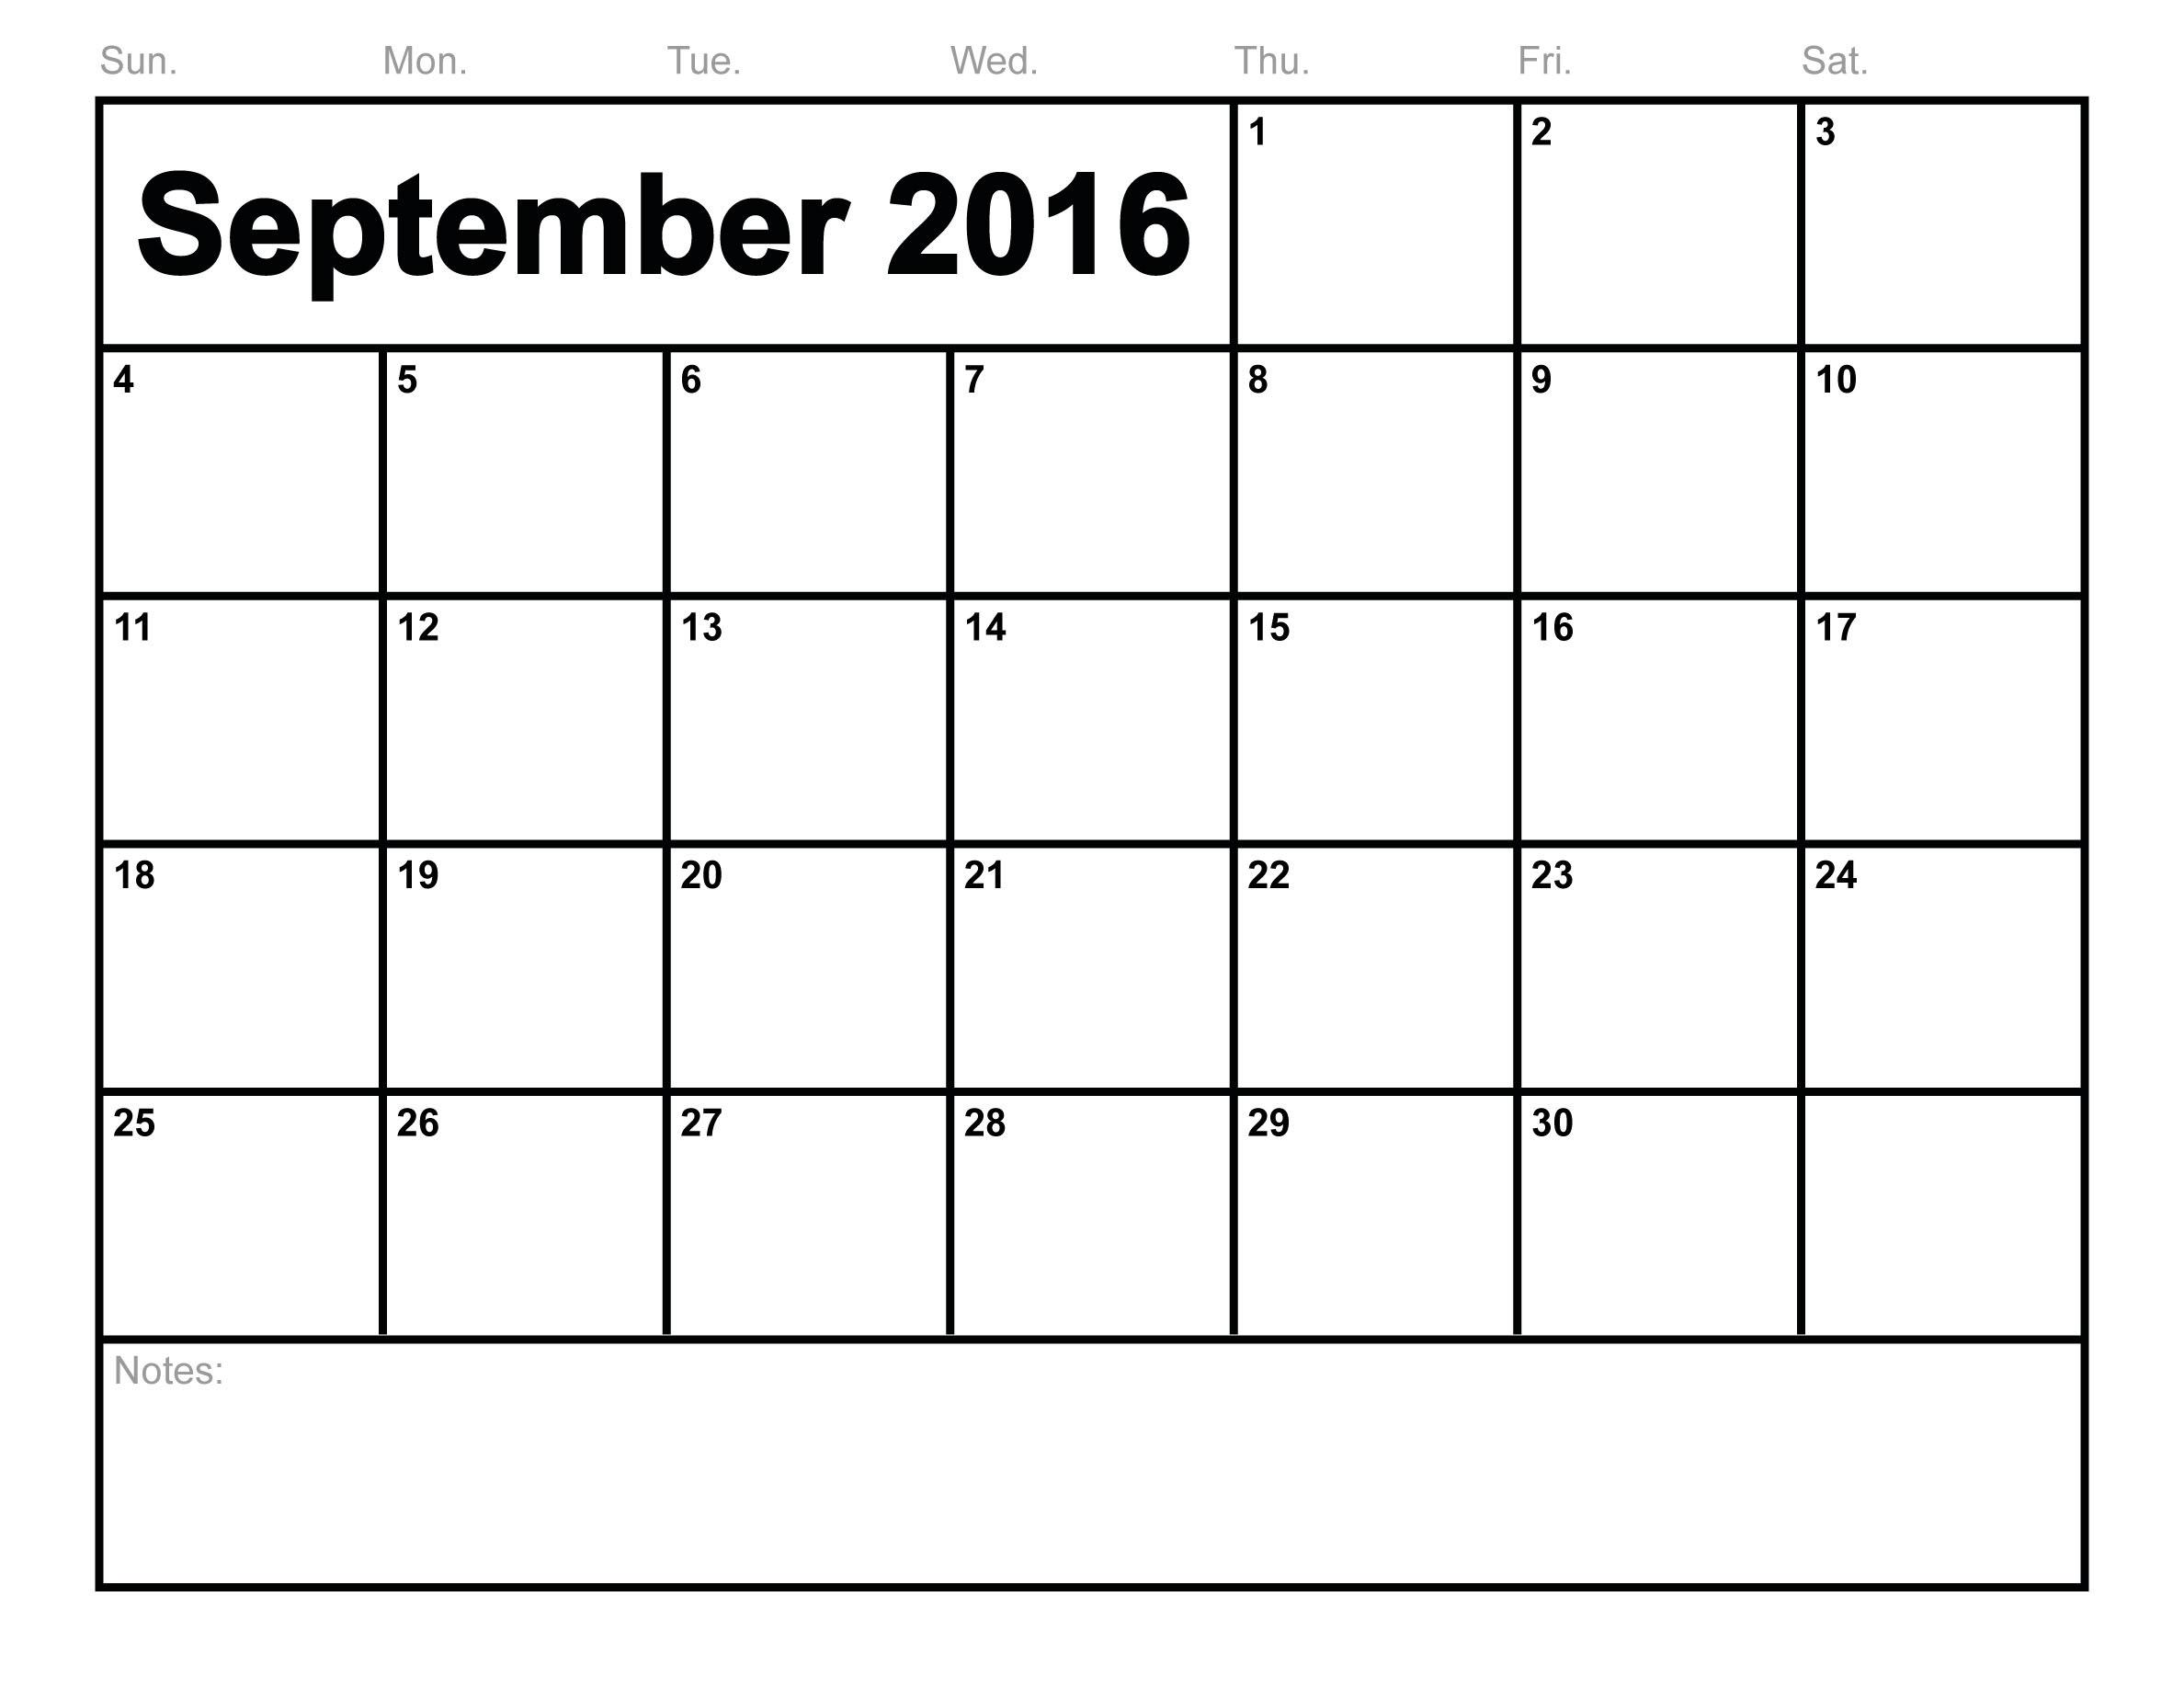 2018 September Printable Calendar Free, Blank Templates Pdf inside September Printable Monthly Calendars Blank